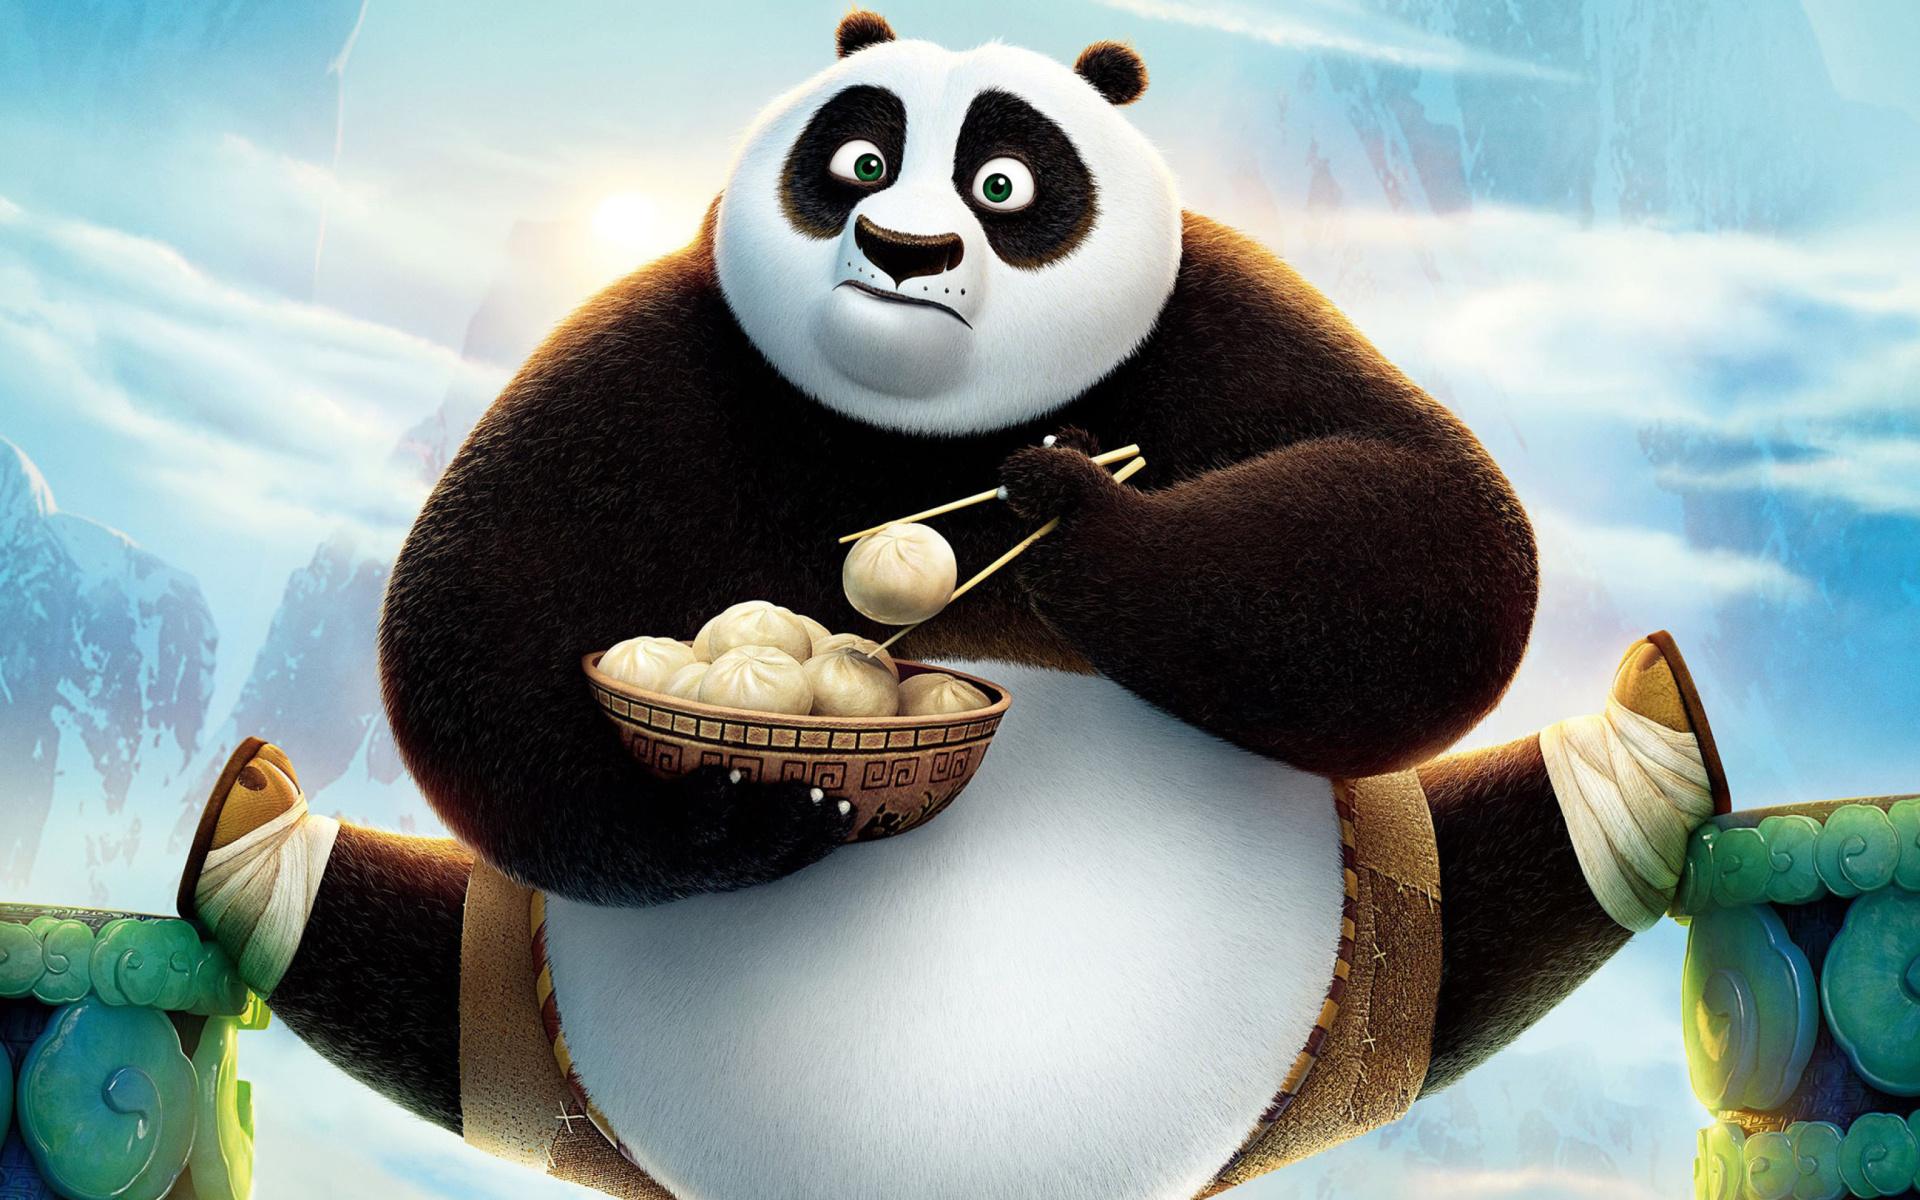 Kung fu panda 3 wallpapers 40 wallpapers adorable - Kung fu panda wallpaper ...